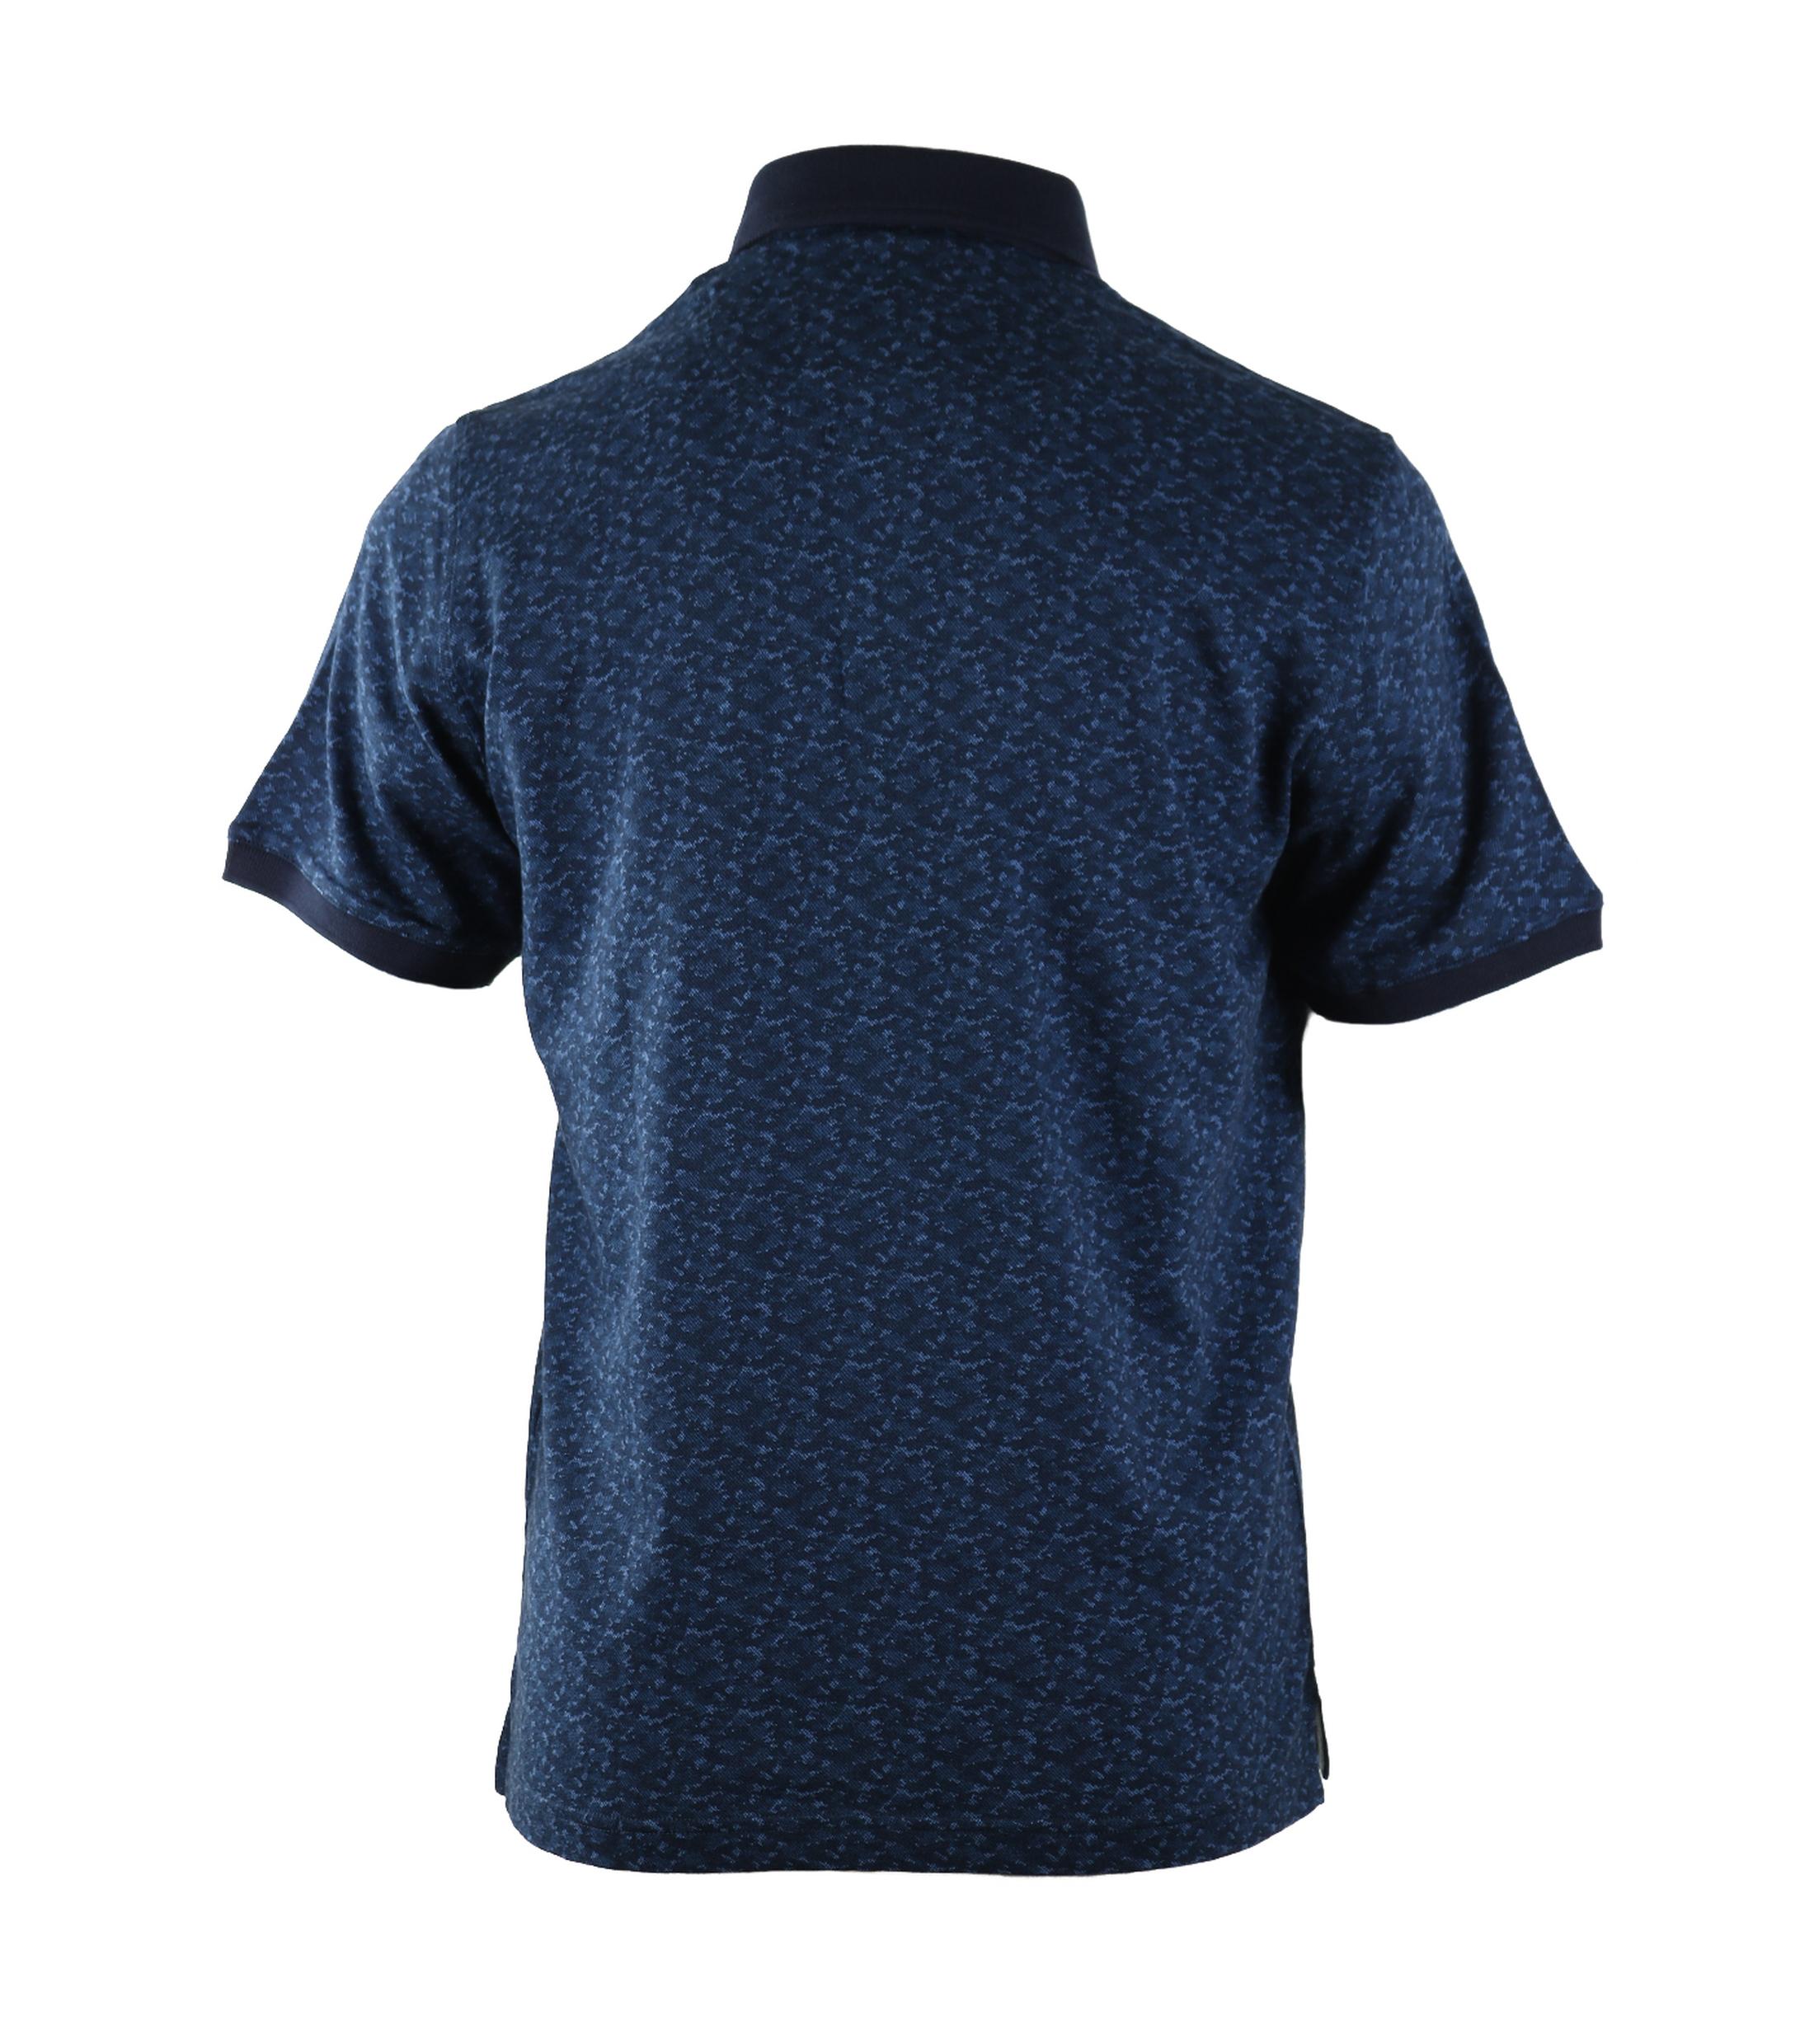 Suitable Polo Blauwe Print foto 1